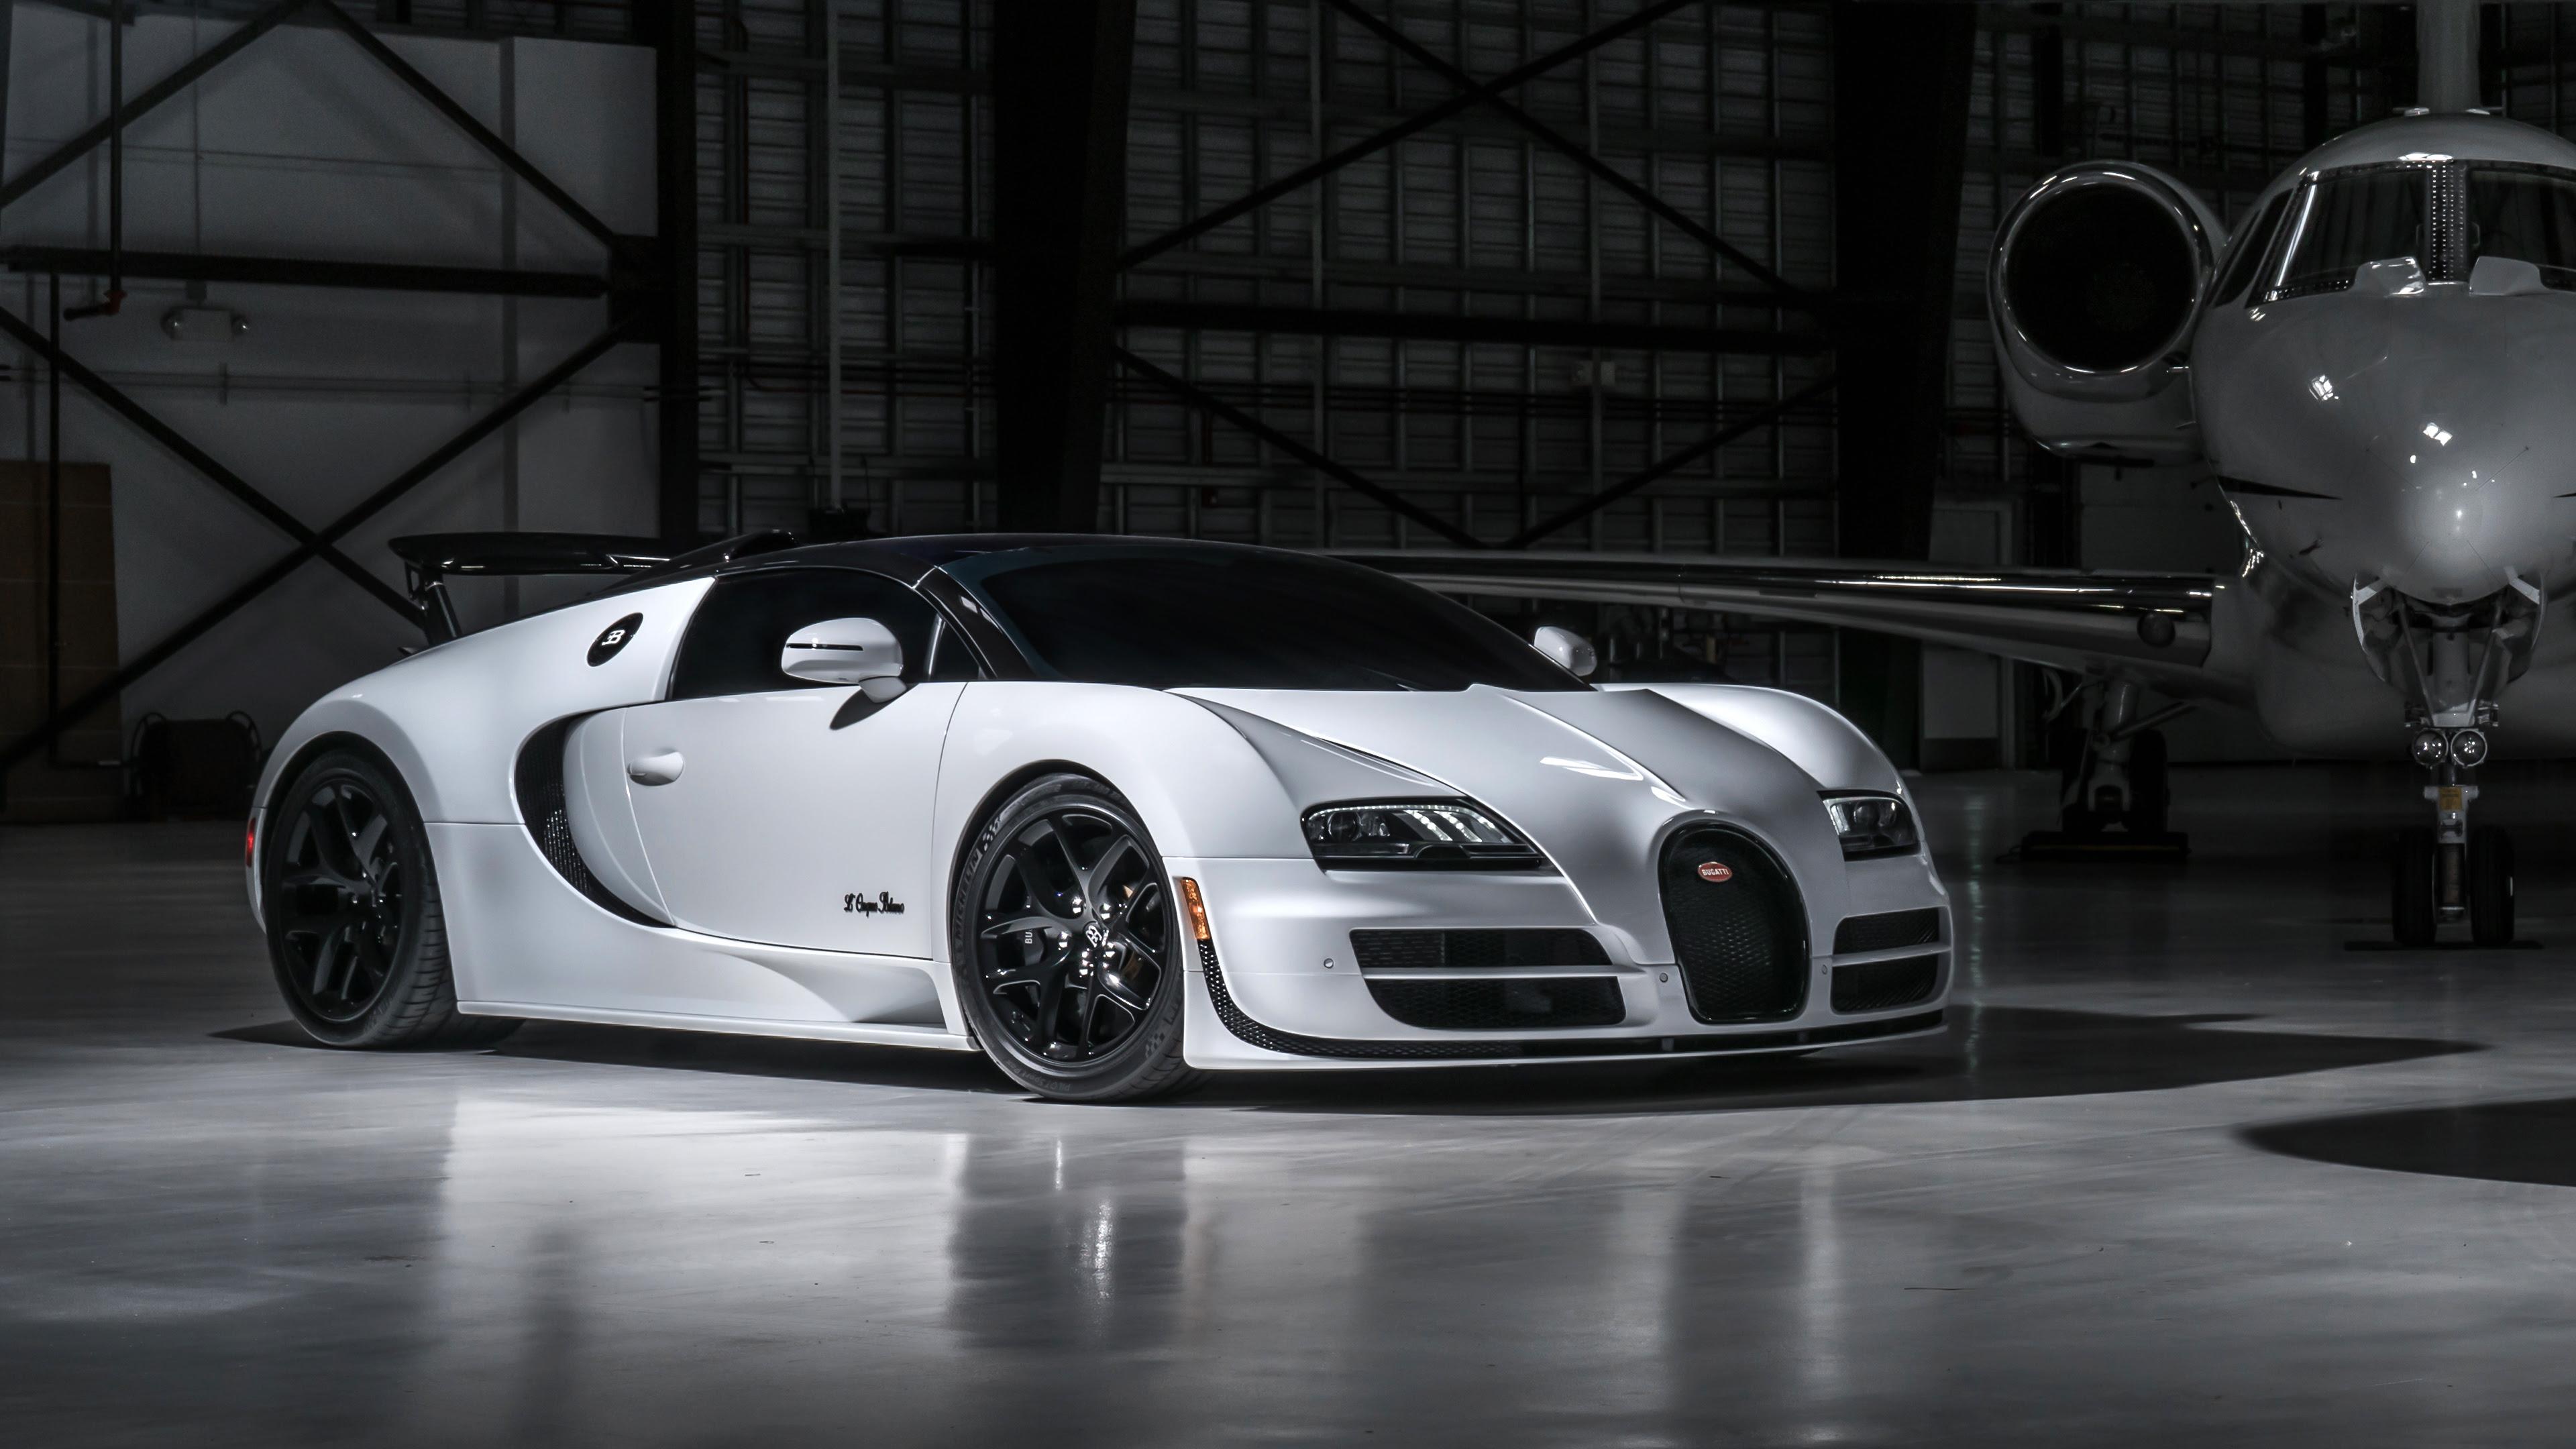 Bugatti Veyron Gr Sport Roadster Vitesse 4k Wallpapers Wallpapers Hd